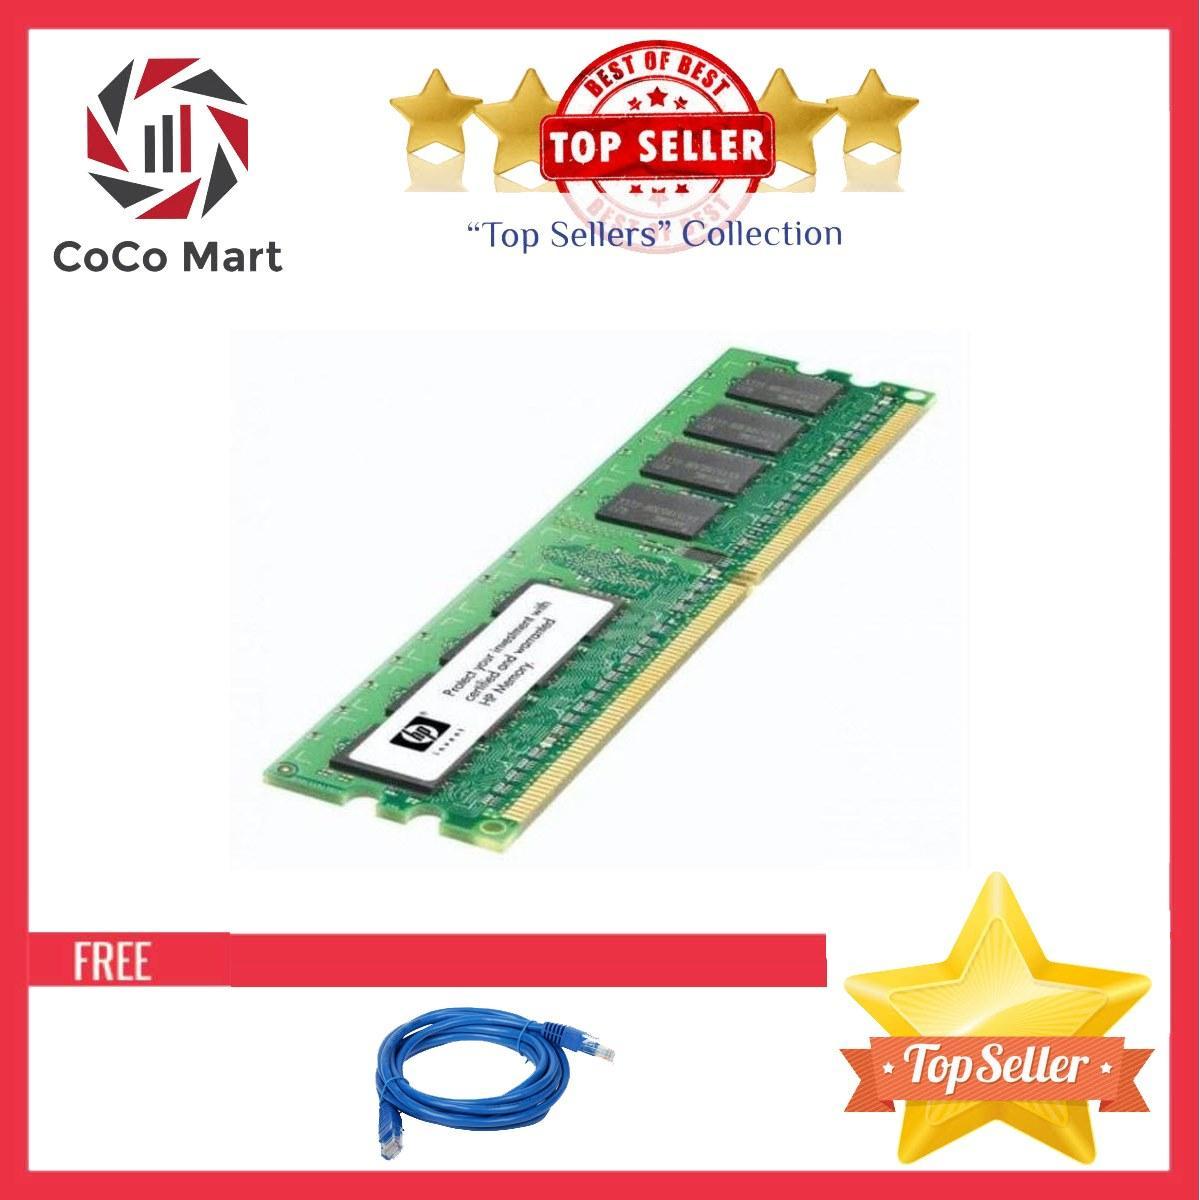 Ram ECC Máy Trạm HP 8GB, DDR 3, Bus 1333Mhz Siêu Bền